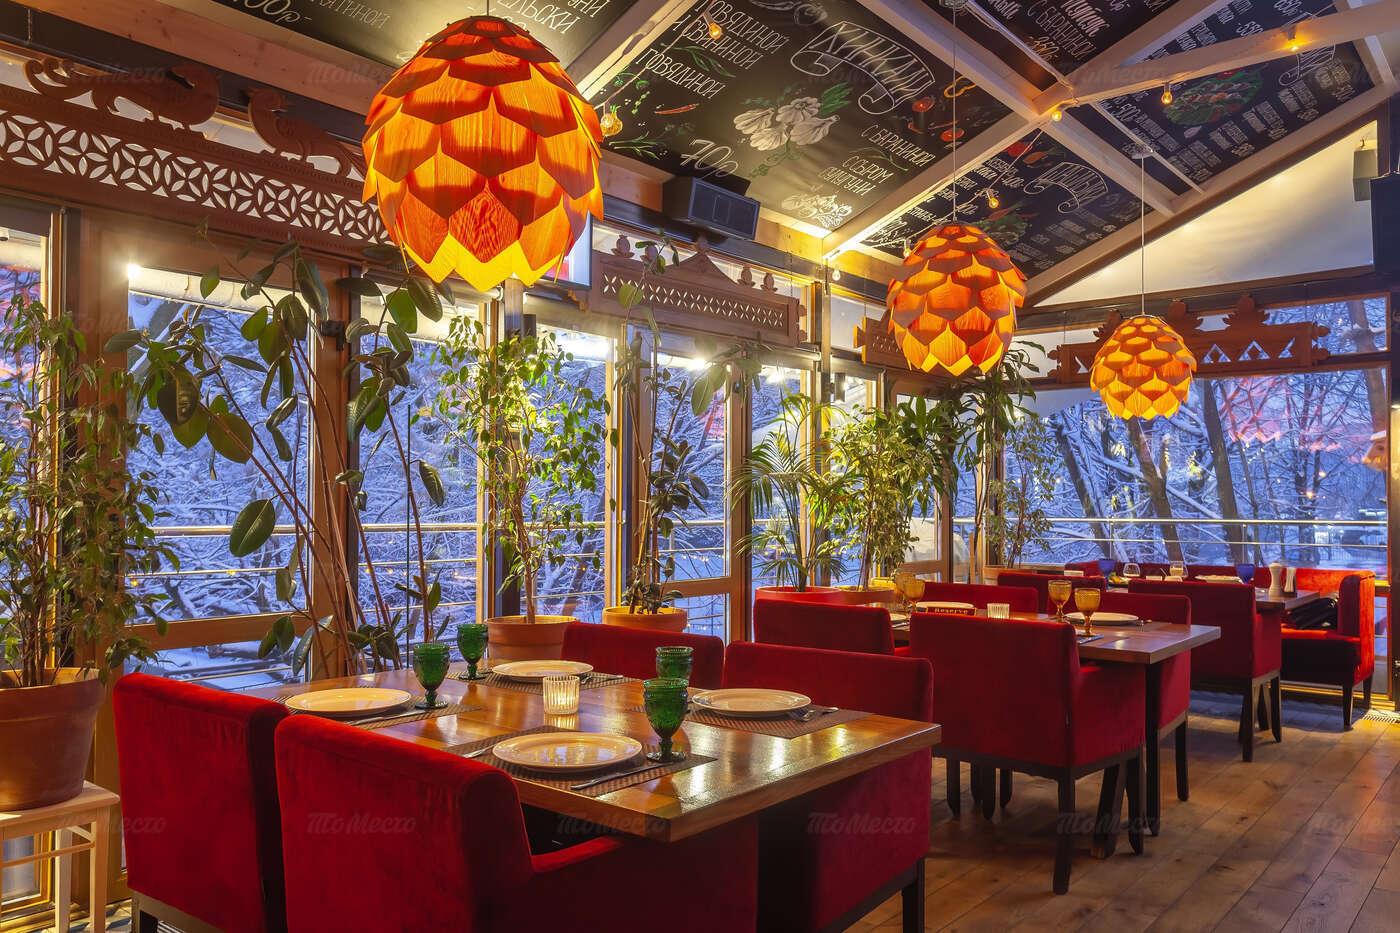 Ресторан Лаваш (Lavash) на Цветном бульваре